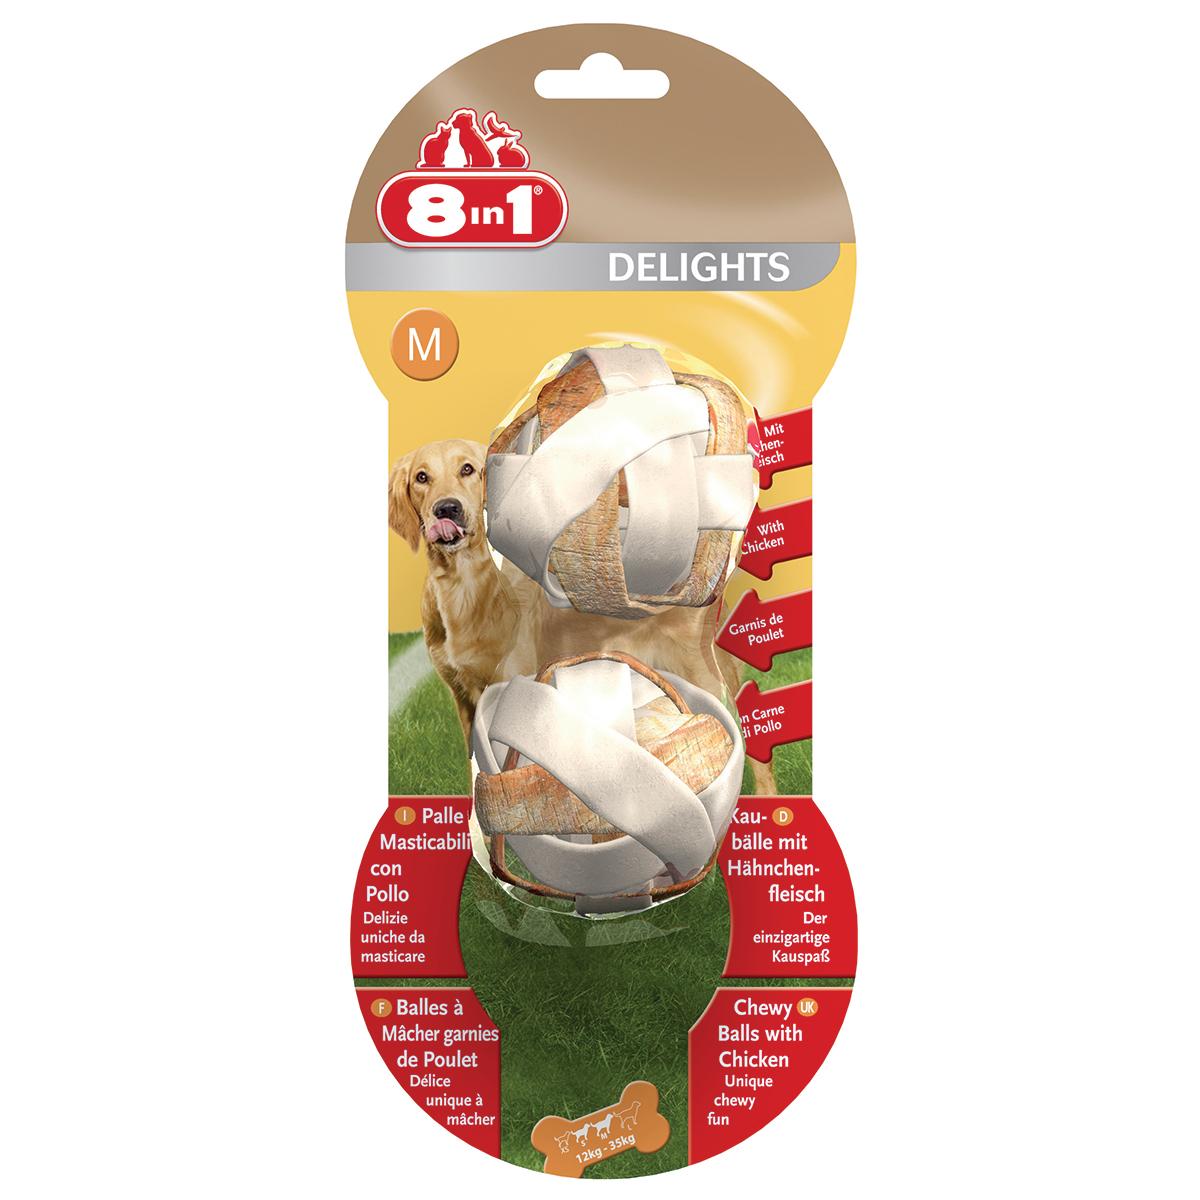 8 in 1 Mingii Delights M imagine